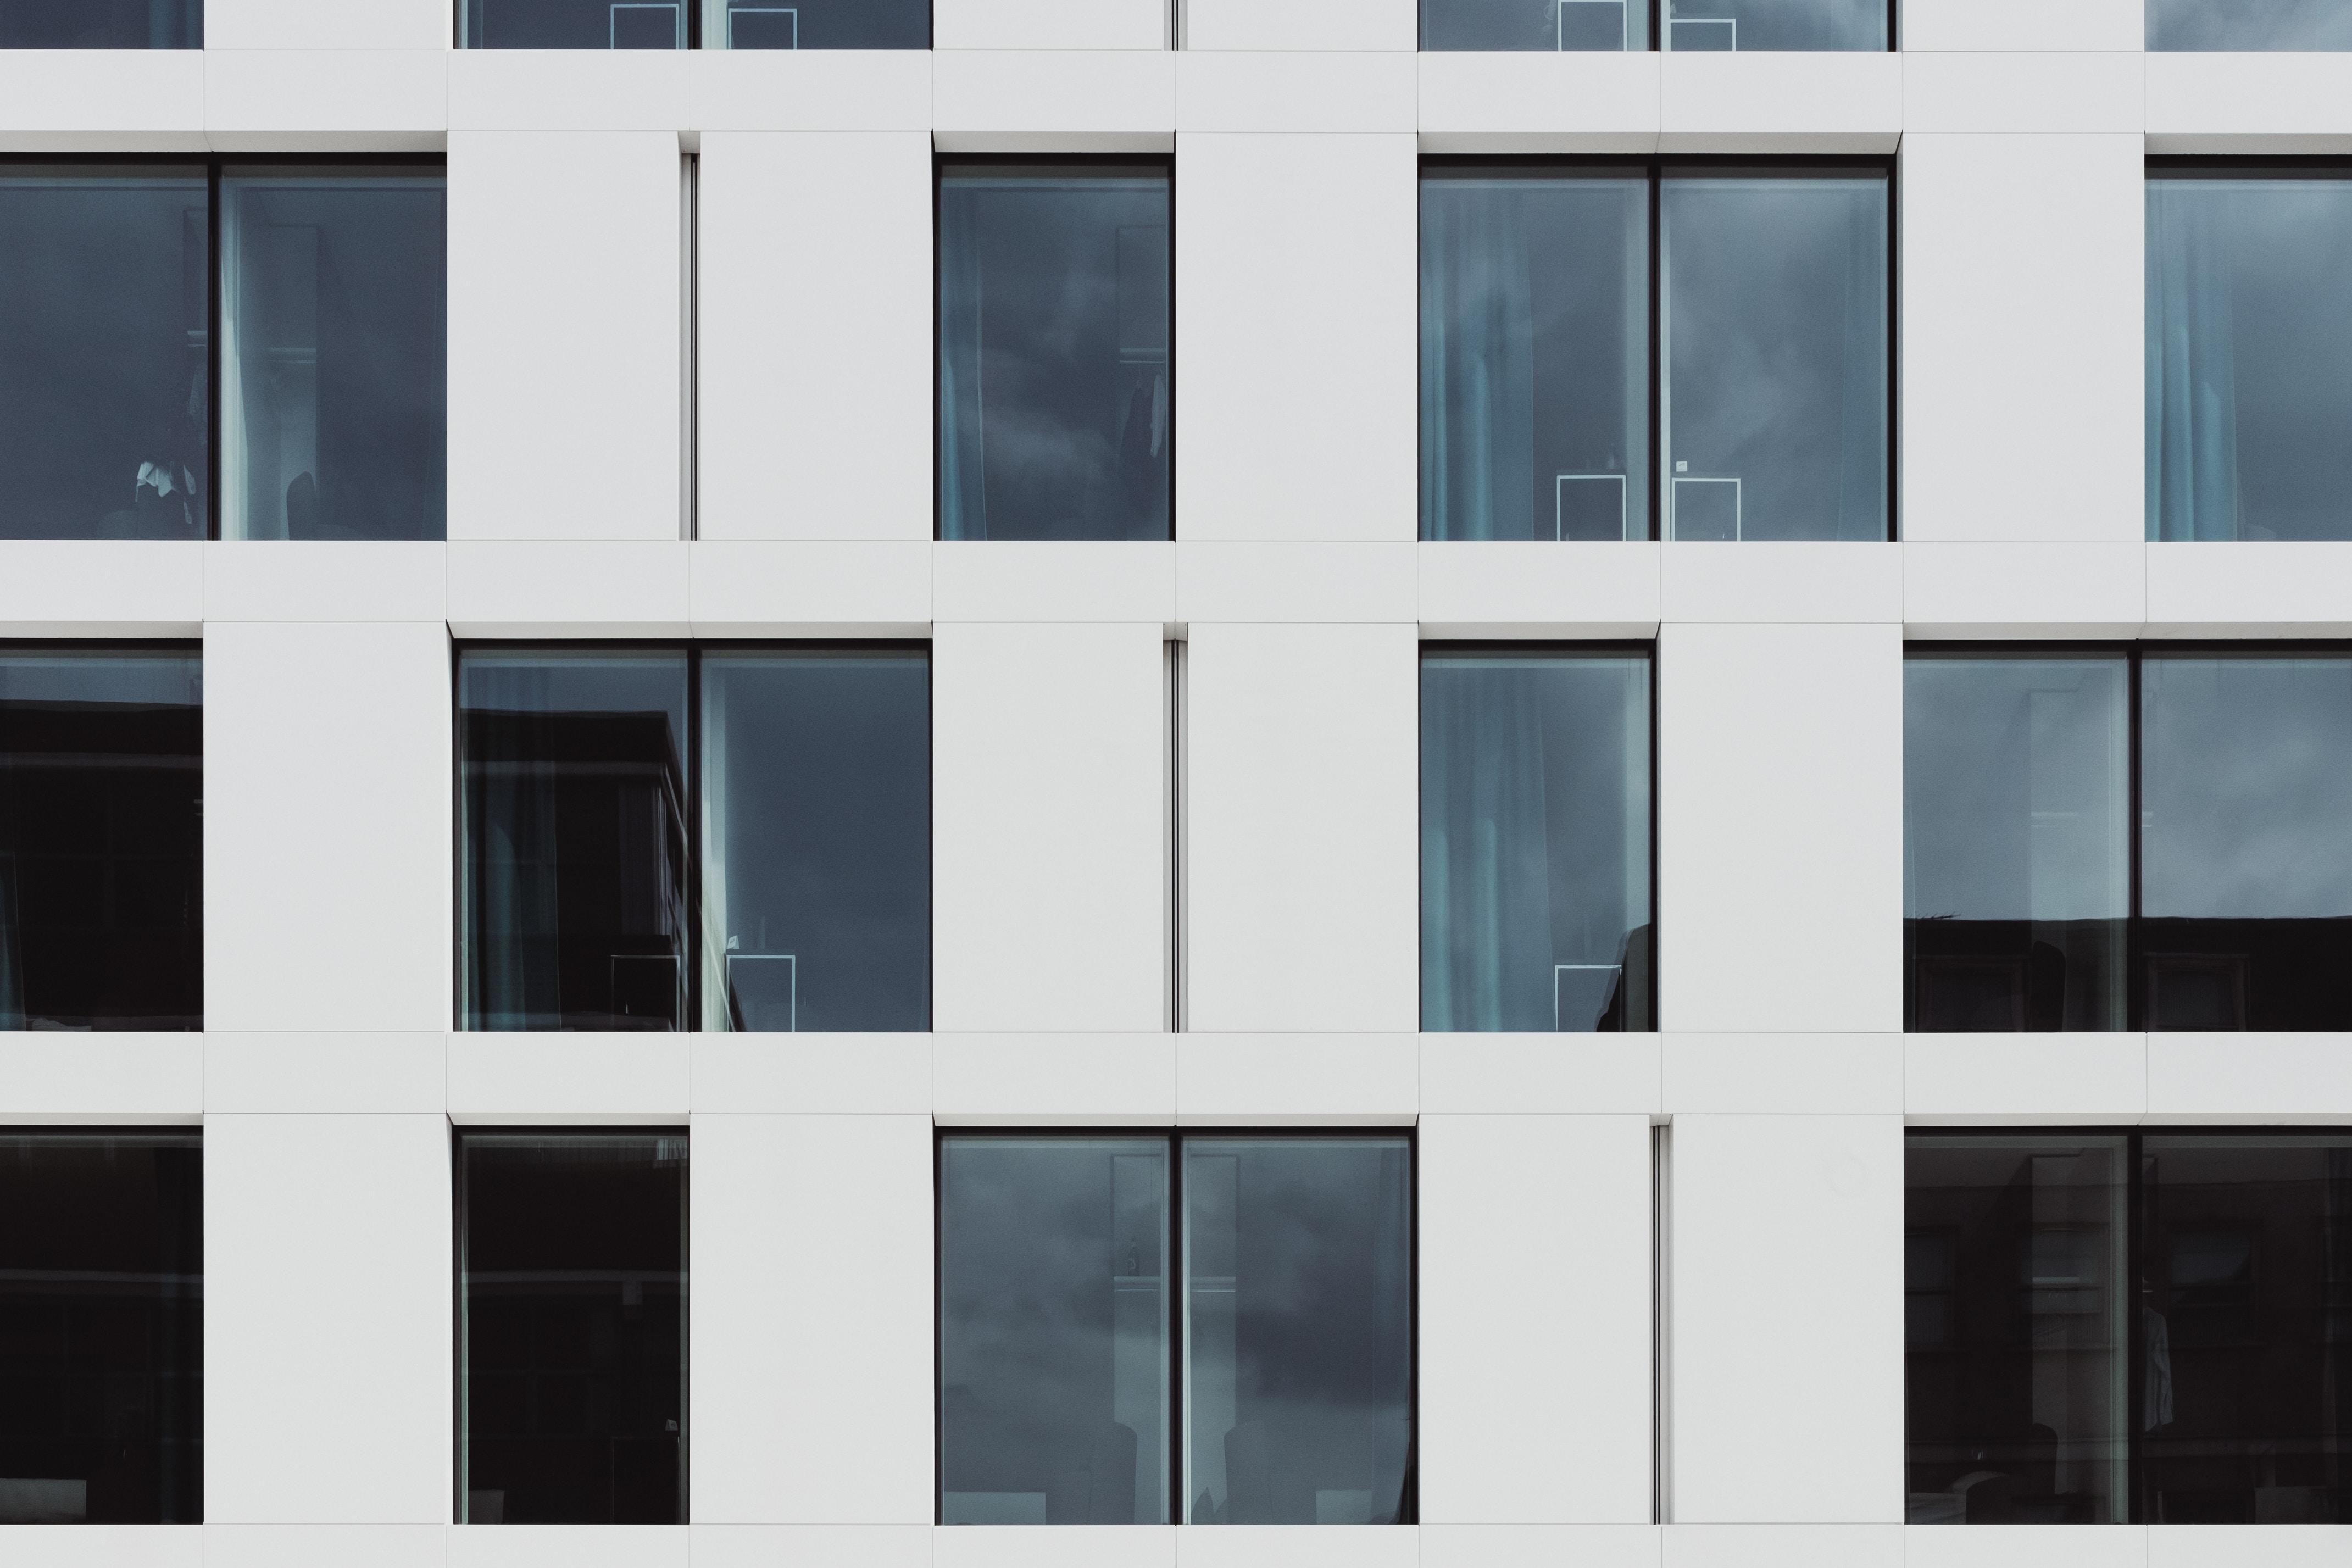 white wooden framed glass window at daytime